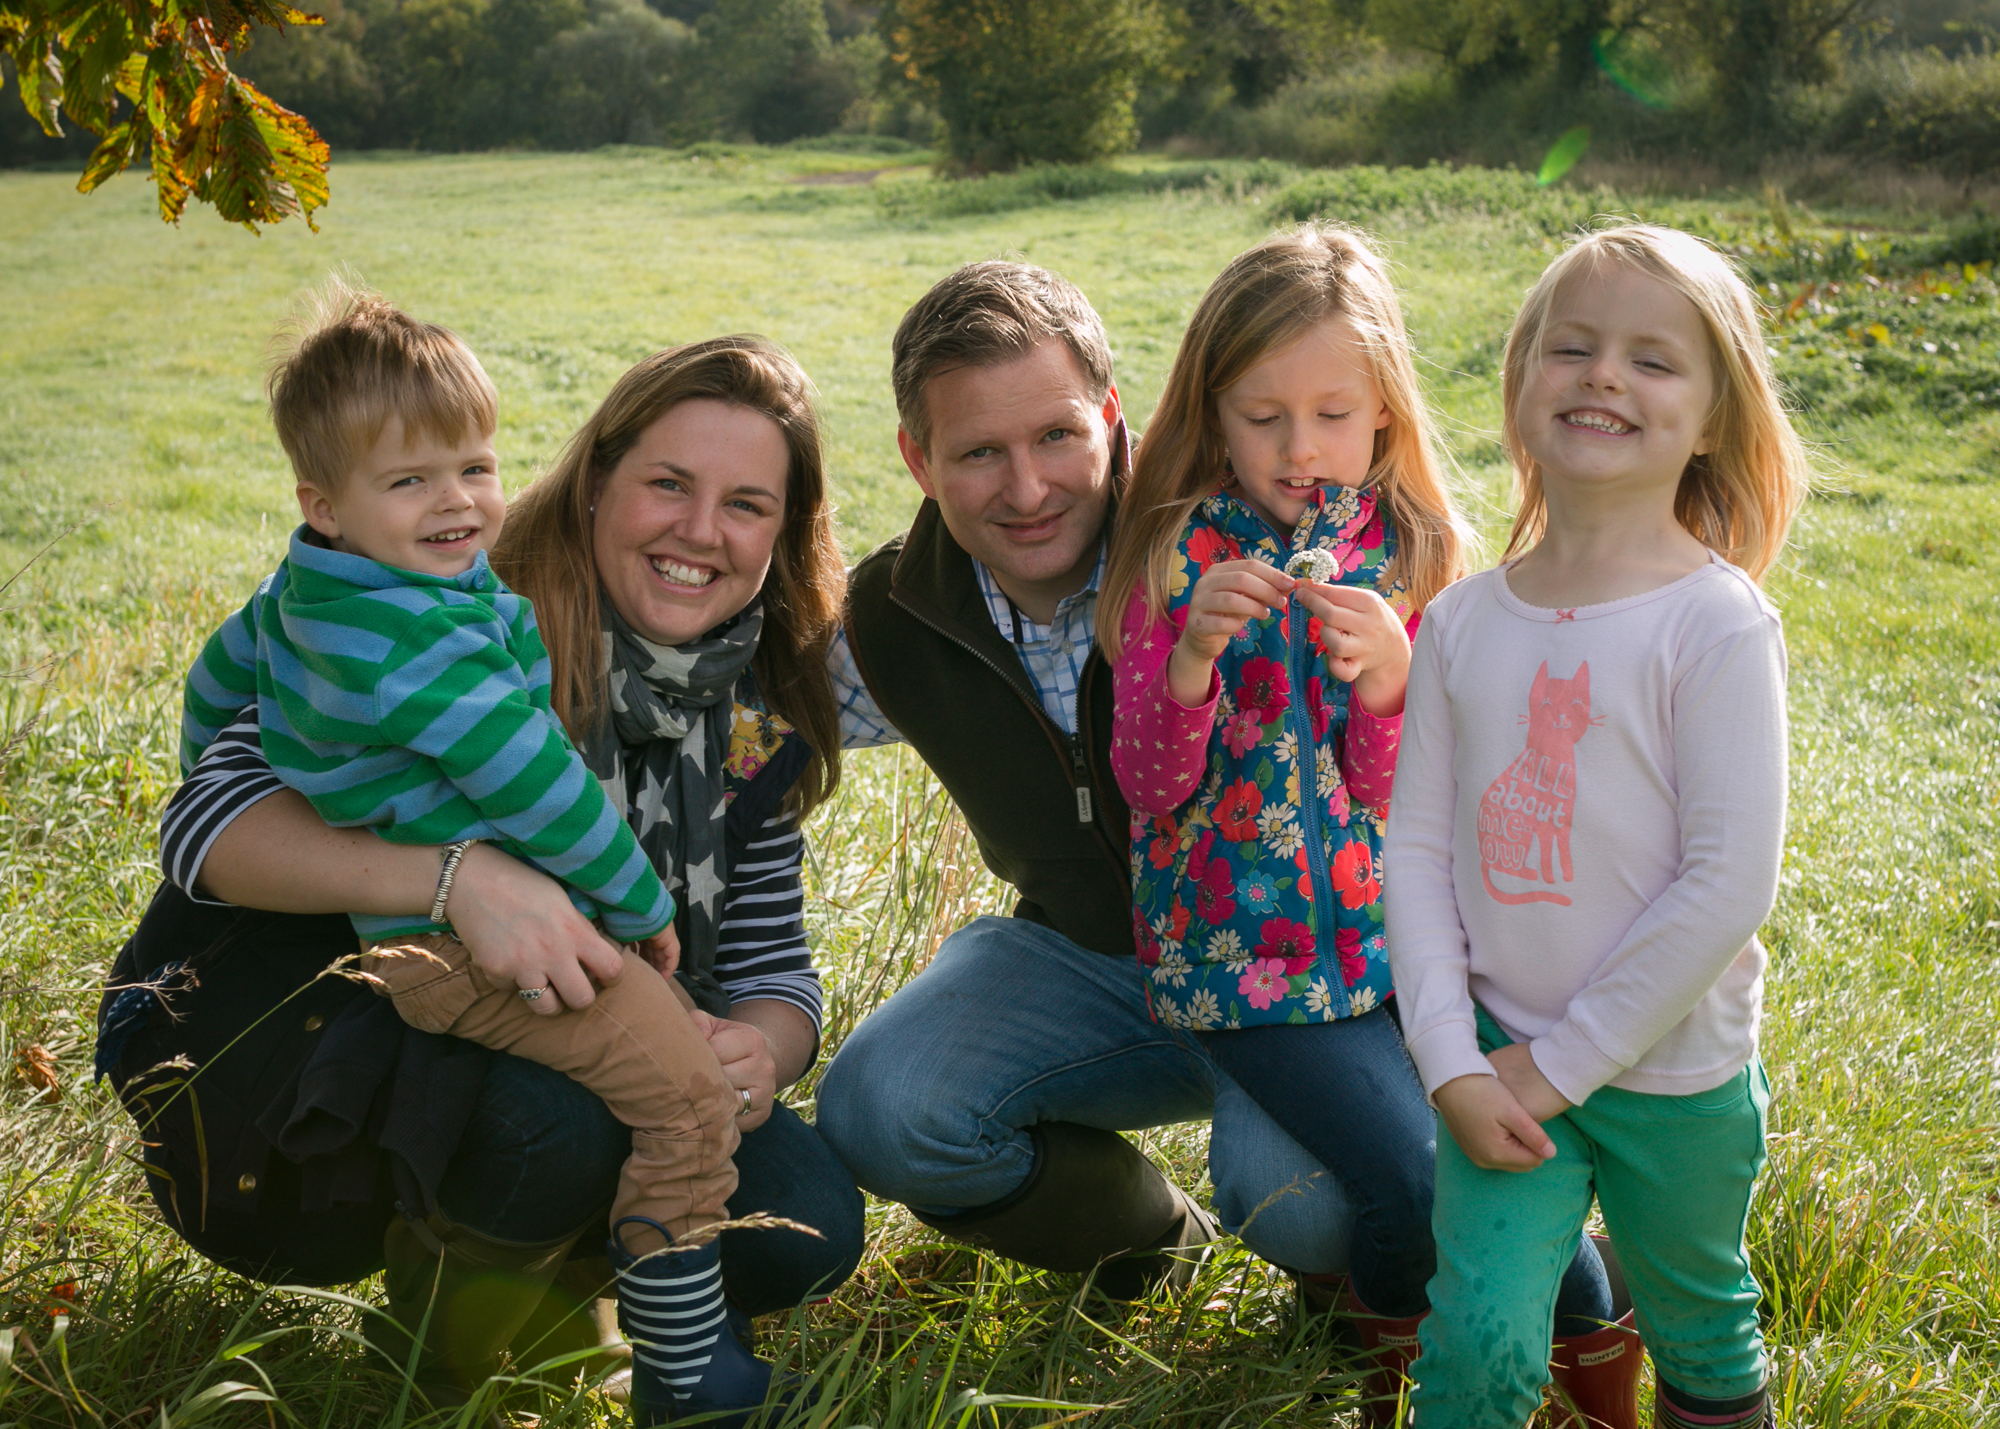 family-photographer-leighton-buzzard